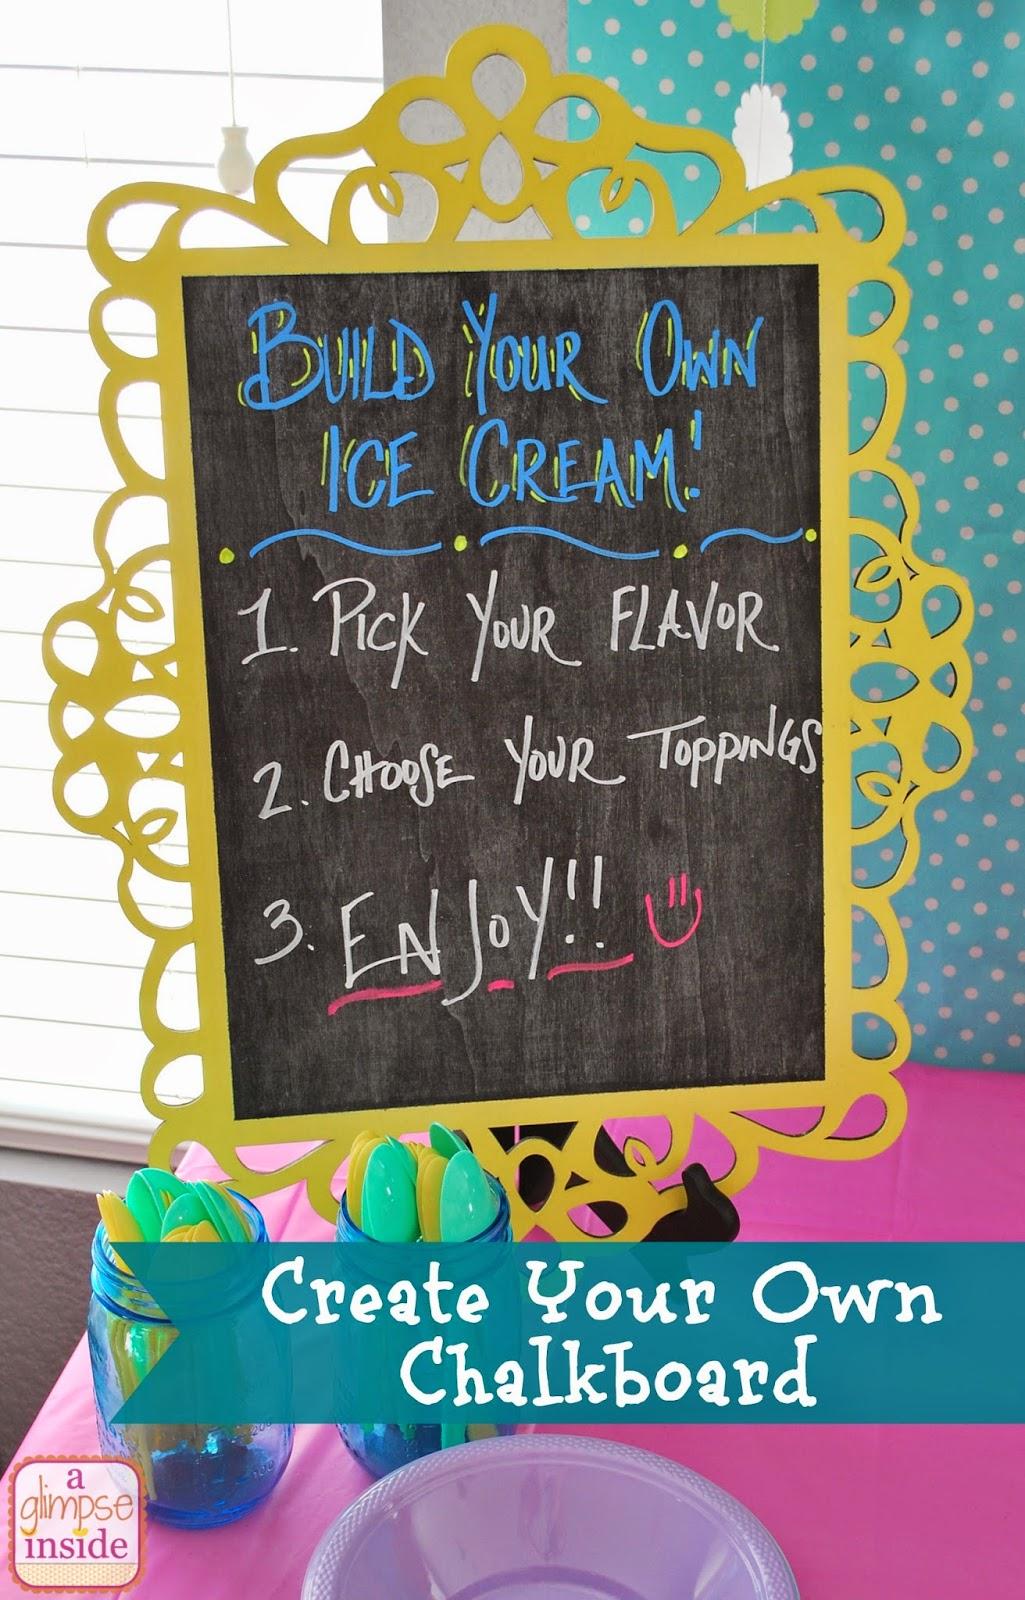 http://www.aglimpseinsideblog.com/2014/06/create-your-own-chalkboard.html